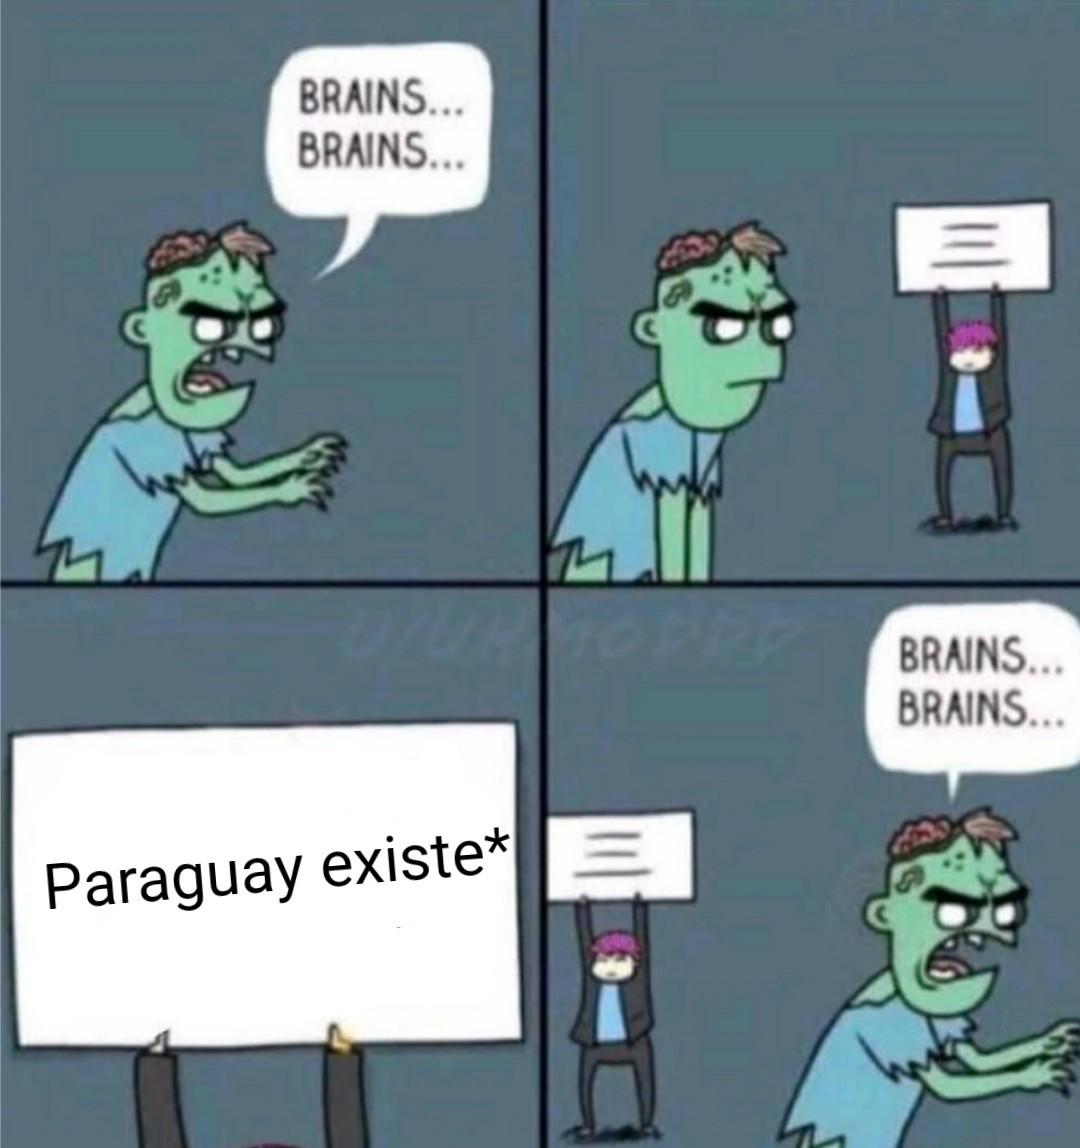 No existe esa cosa - meme